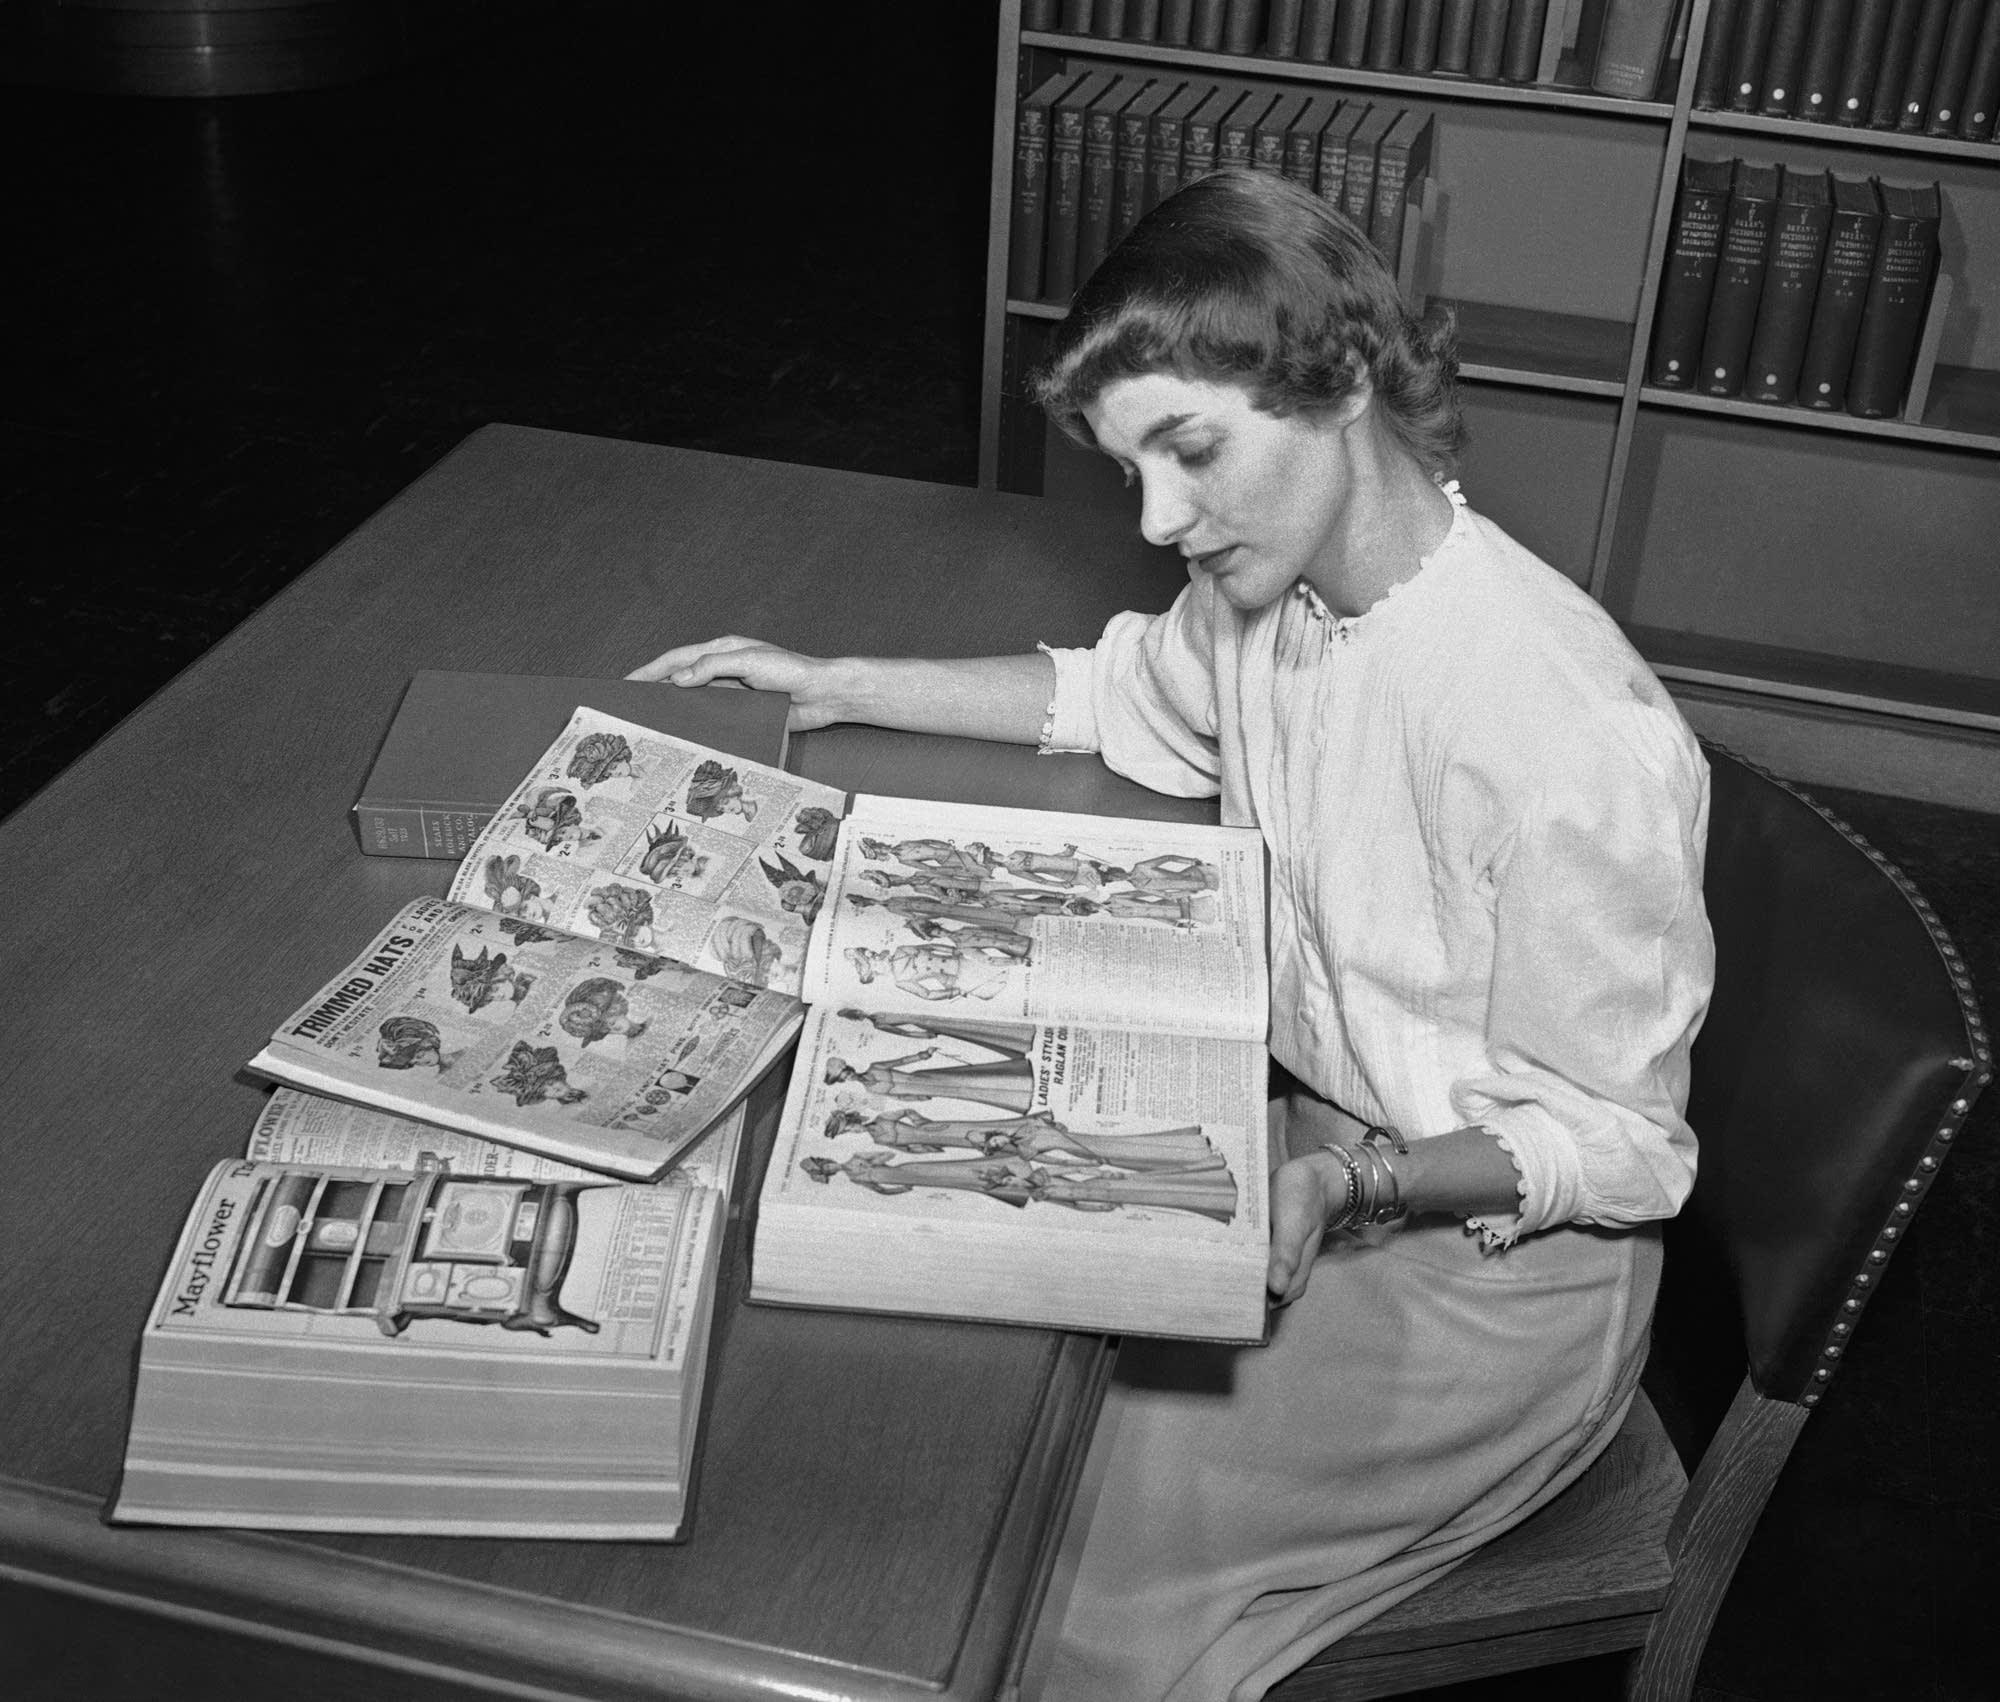 3bdd9afa536 Ruth Parrington studies early Sears Roebuck catalogs.